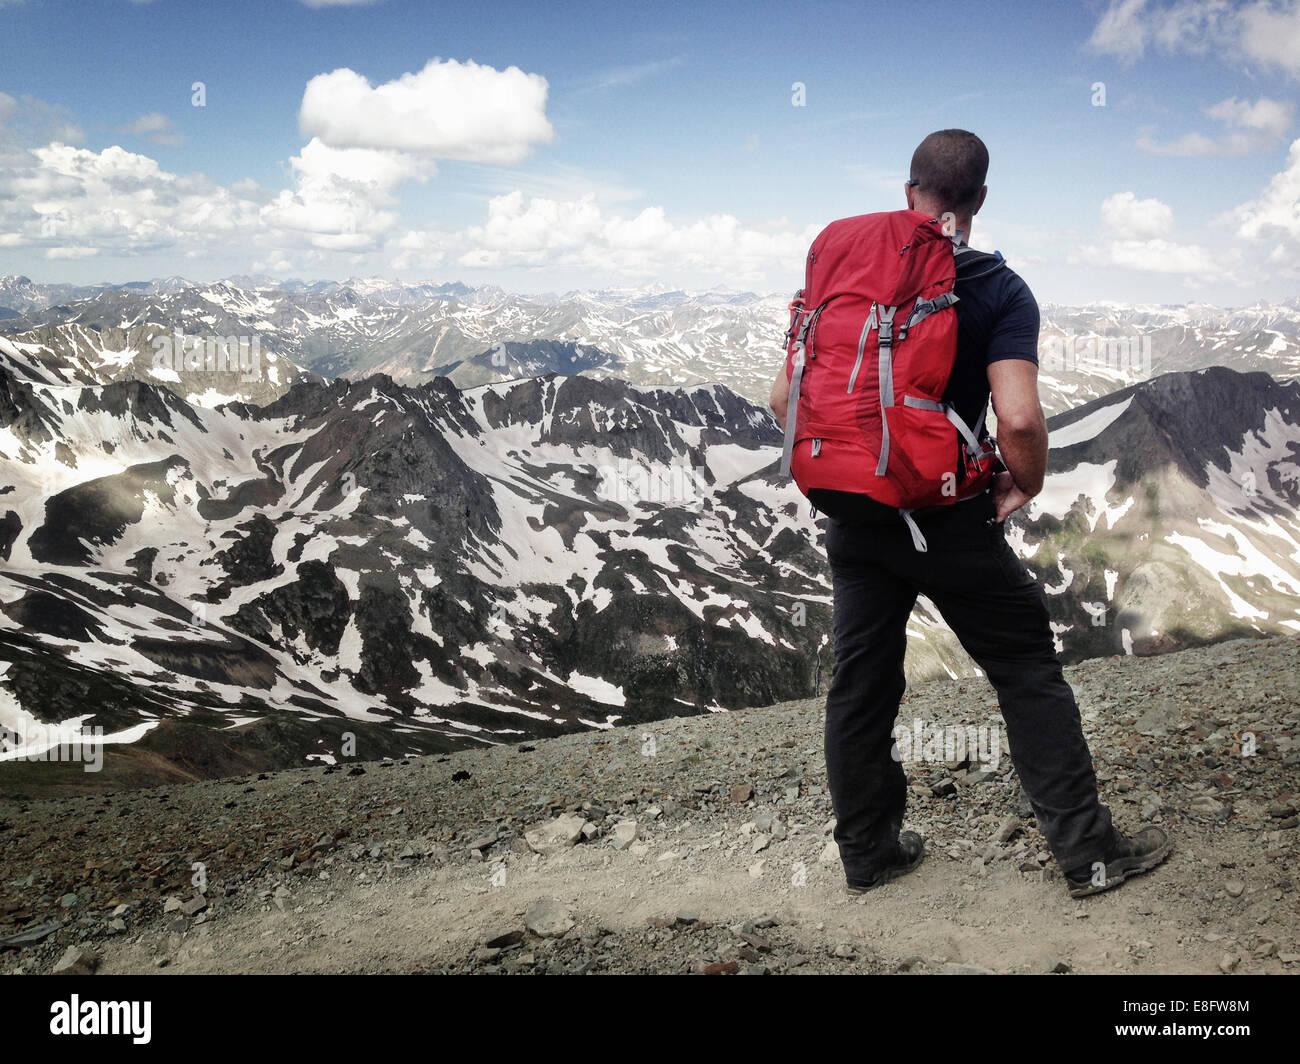 Wanderer, Blick auf Berge, Kolorado, America, USA Stockbild